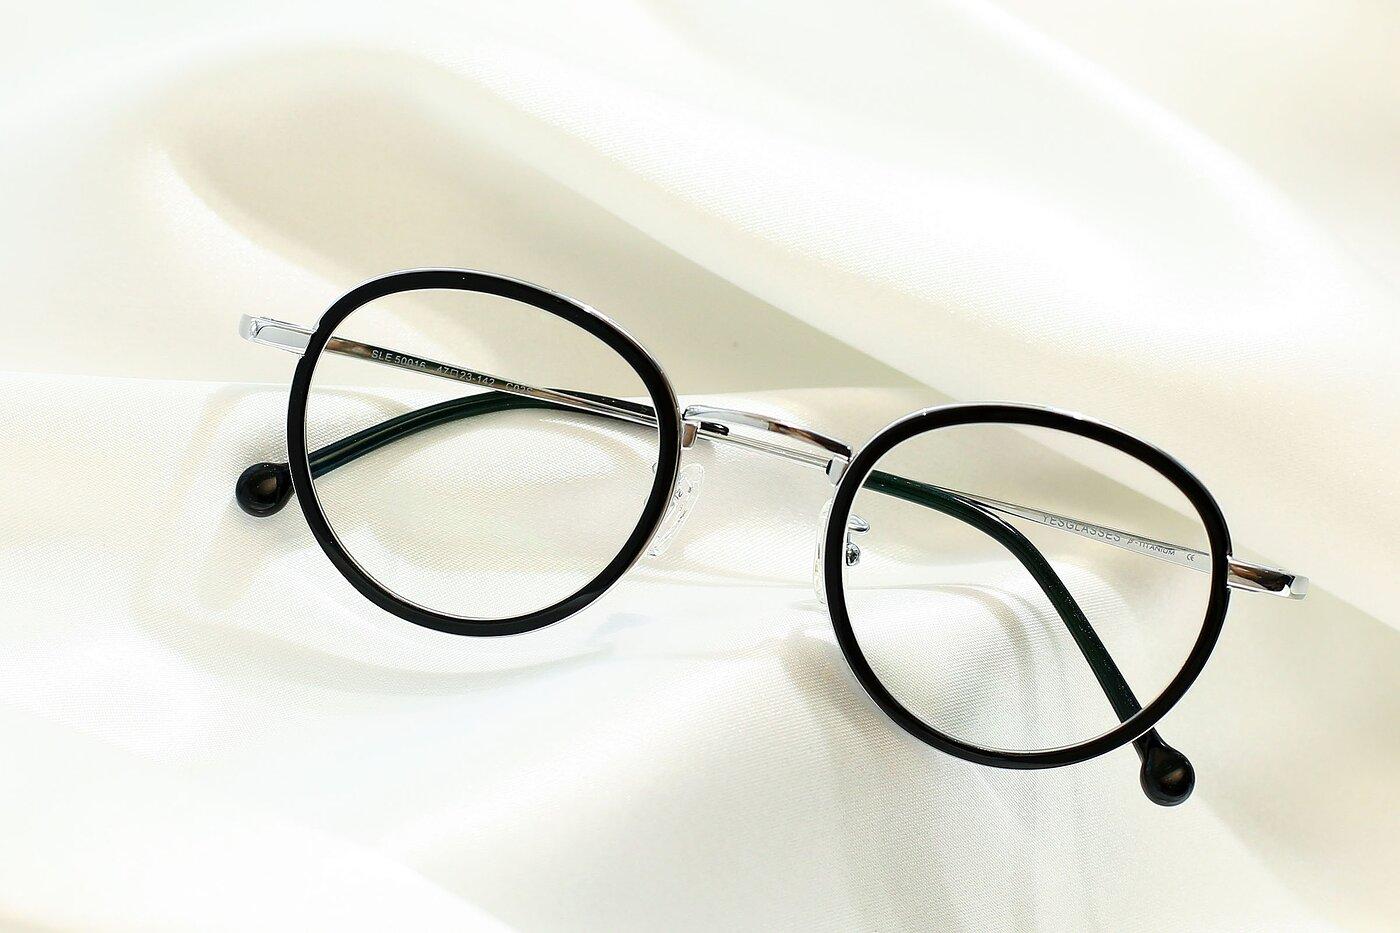 Black-Silver Retro-Vintage Lightweight Round Eyeglasses